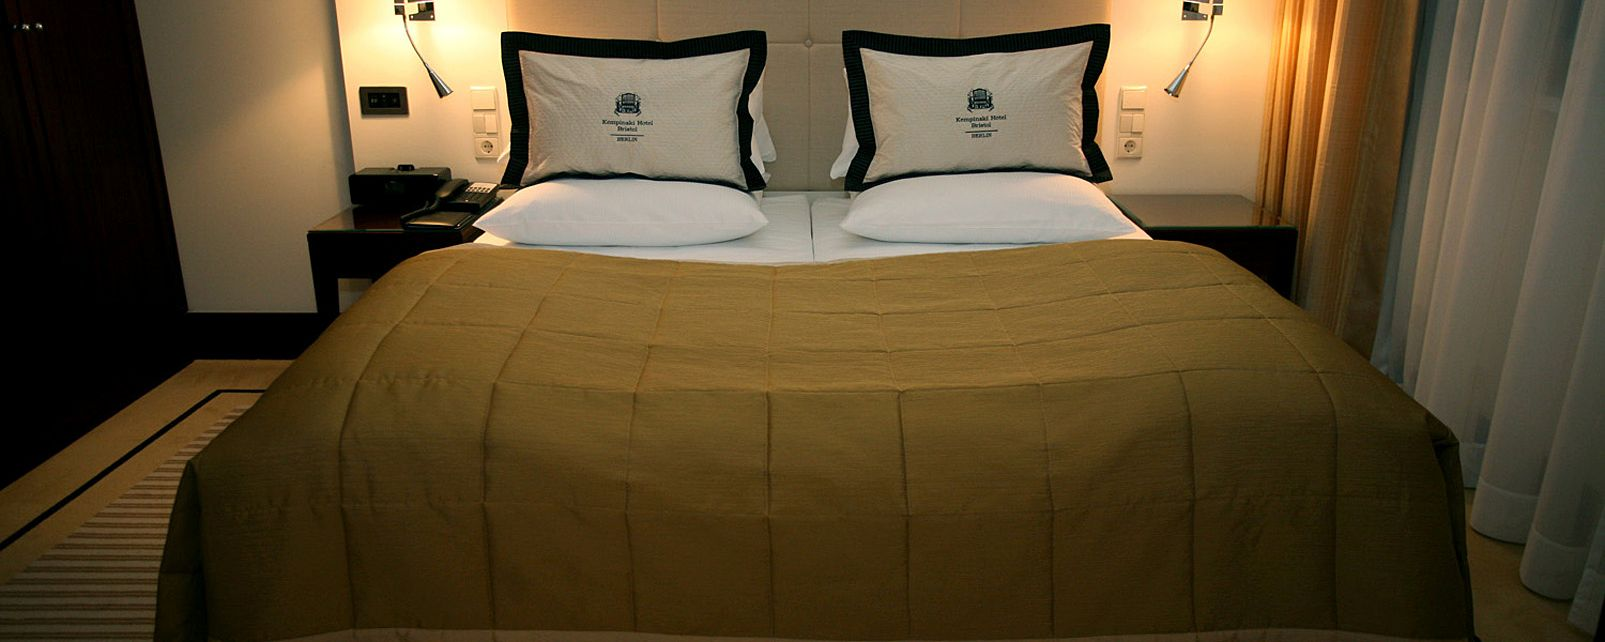 Hotel Kempinski Bristol